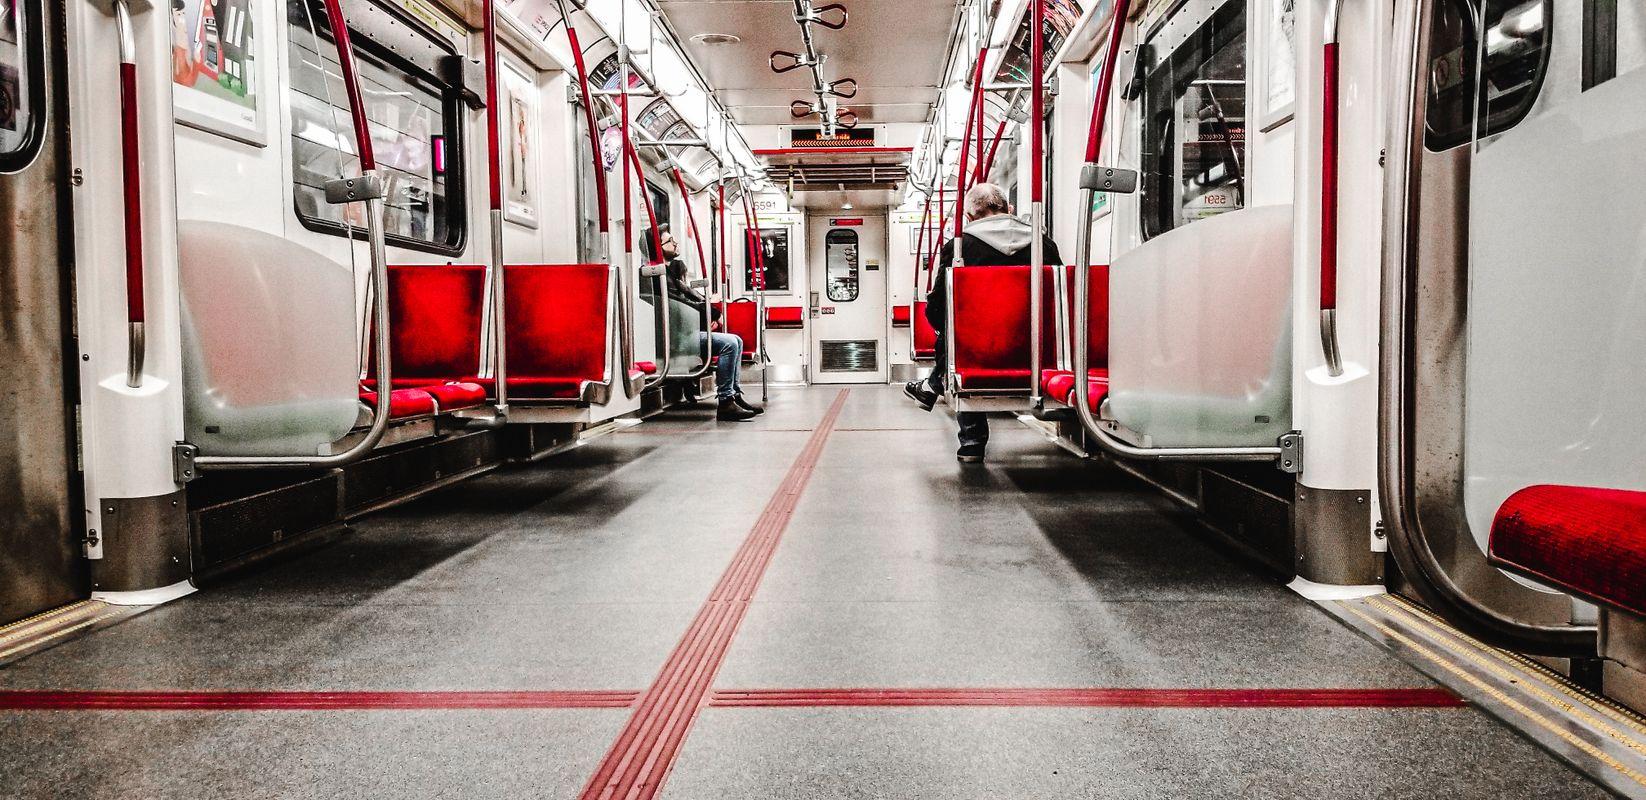 TTC - Toronto Transit Commission